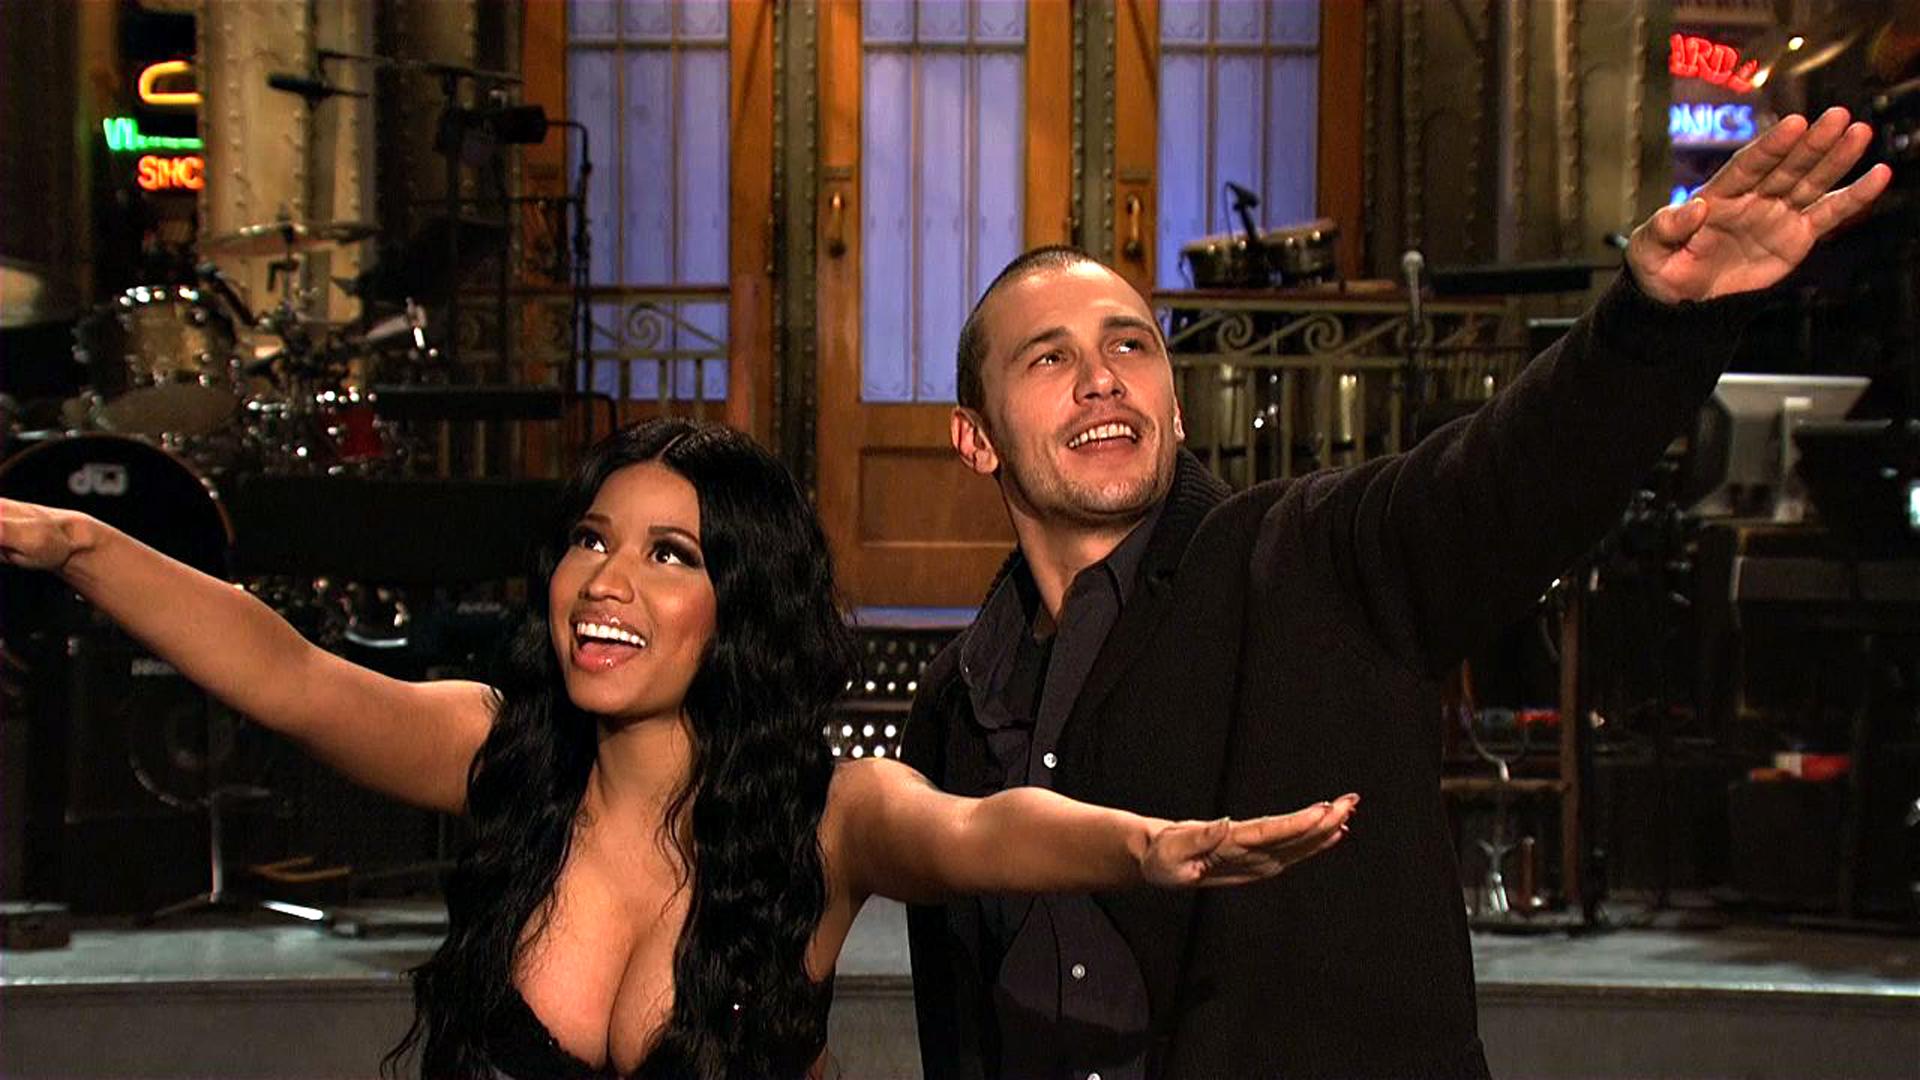 Watch SNL Promo James Franco And Nicki Minaj Are Best